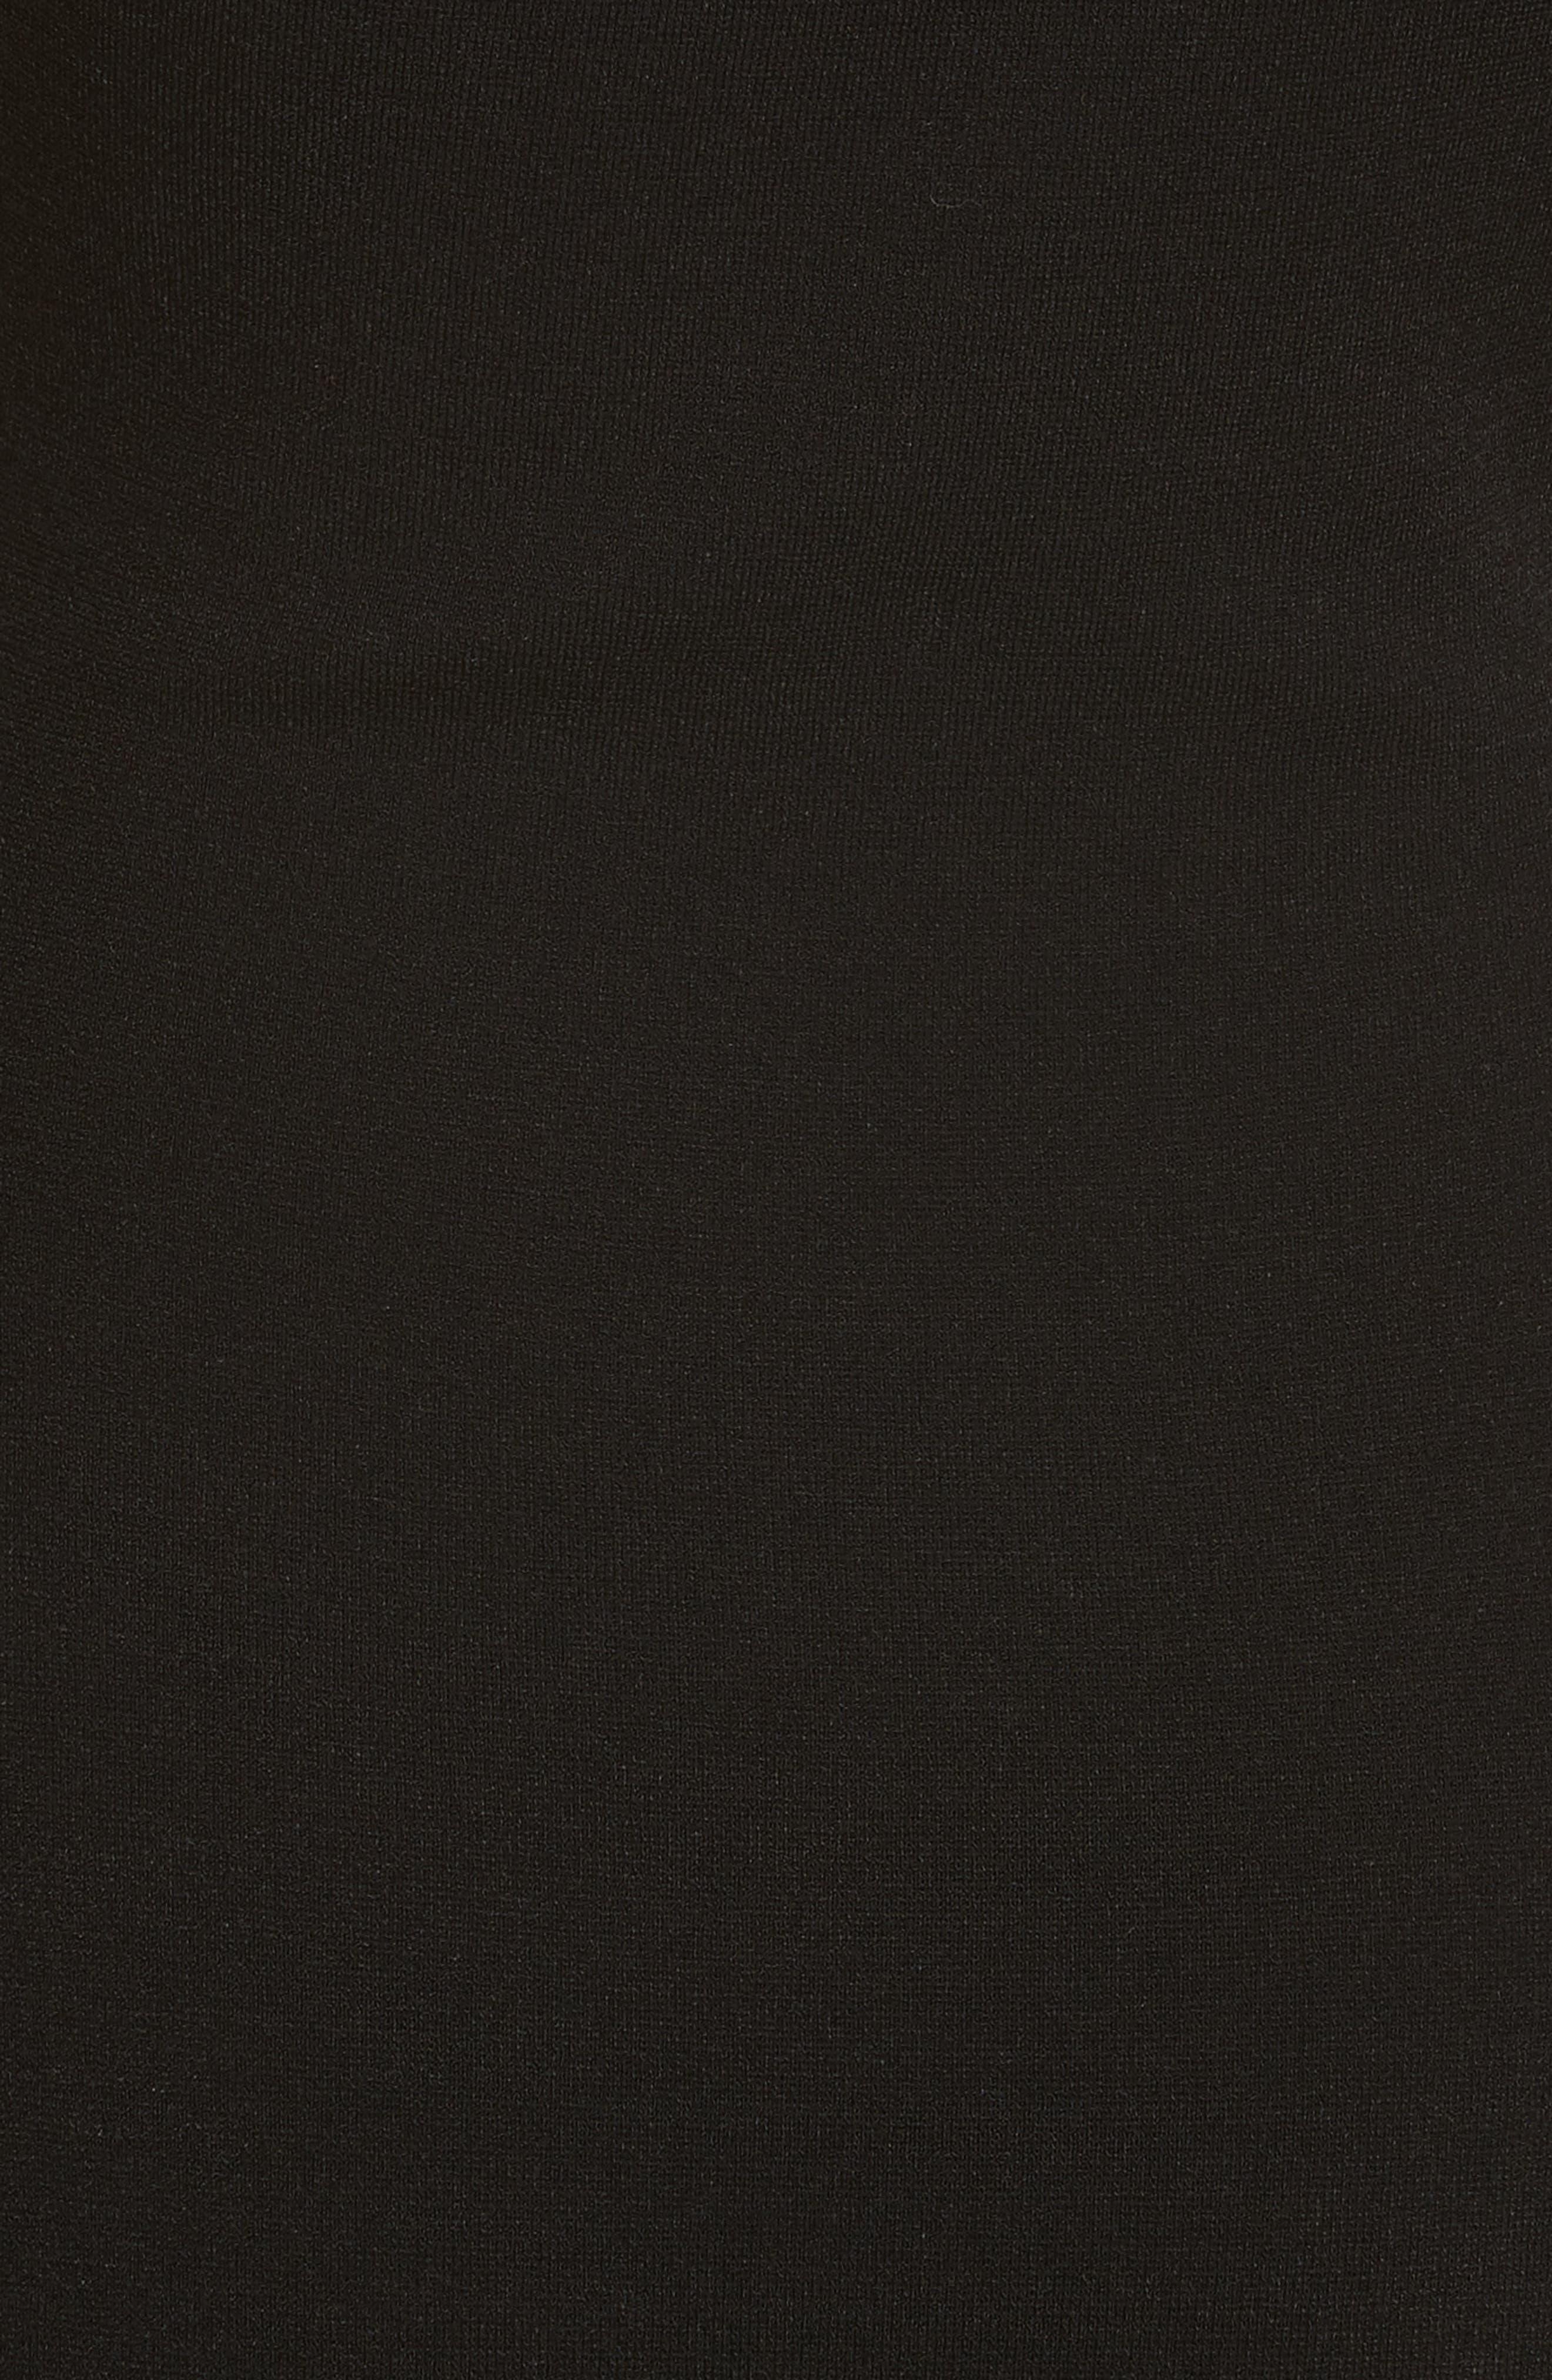 Diane von Furstenberg Knit One-Shoulder Midi Dress,                             Alternate thumbnail 12, color,